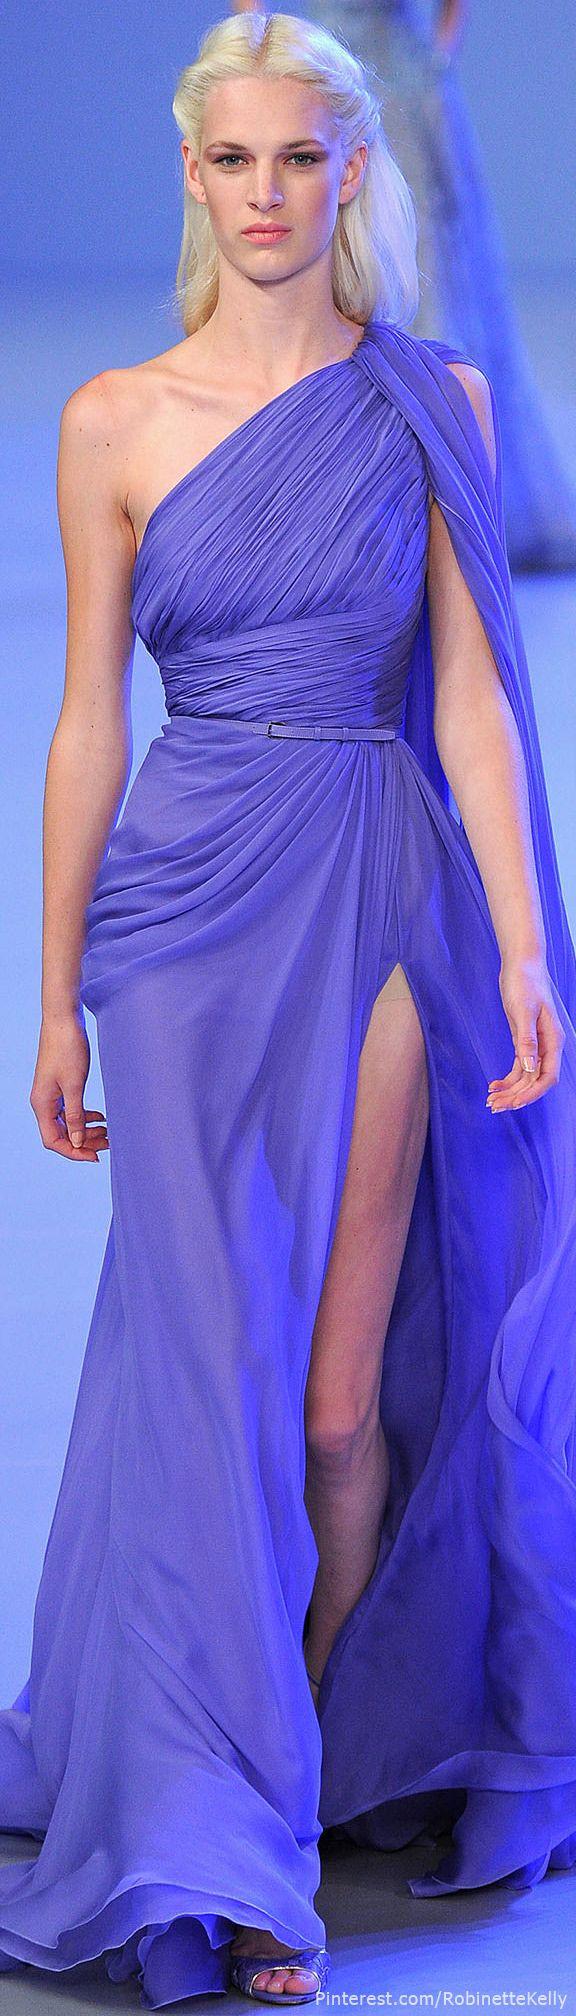 2132 best Pretty in Purple !!!! images on Pinterest | Beautiful ...